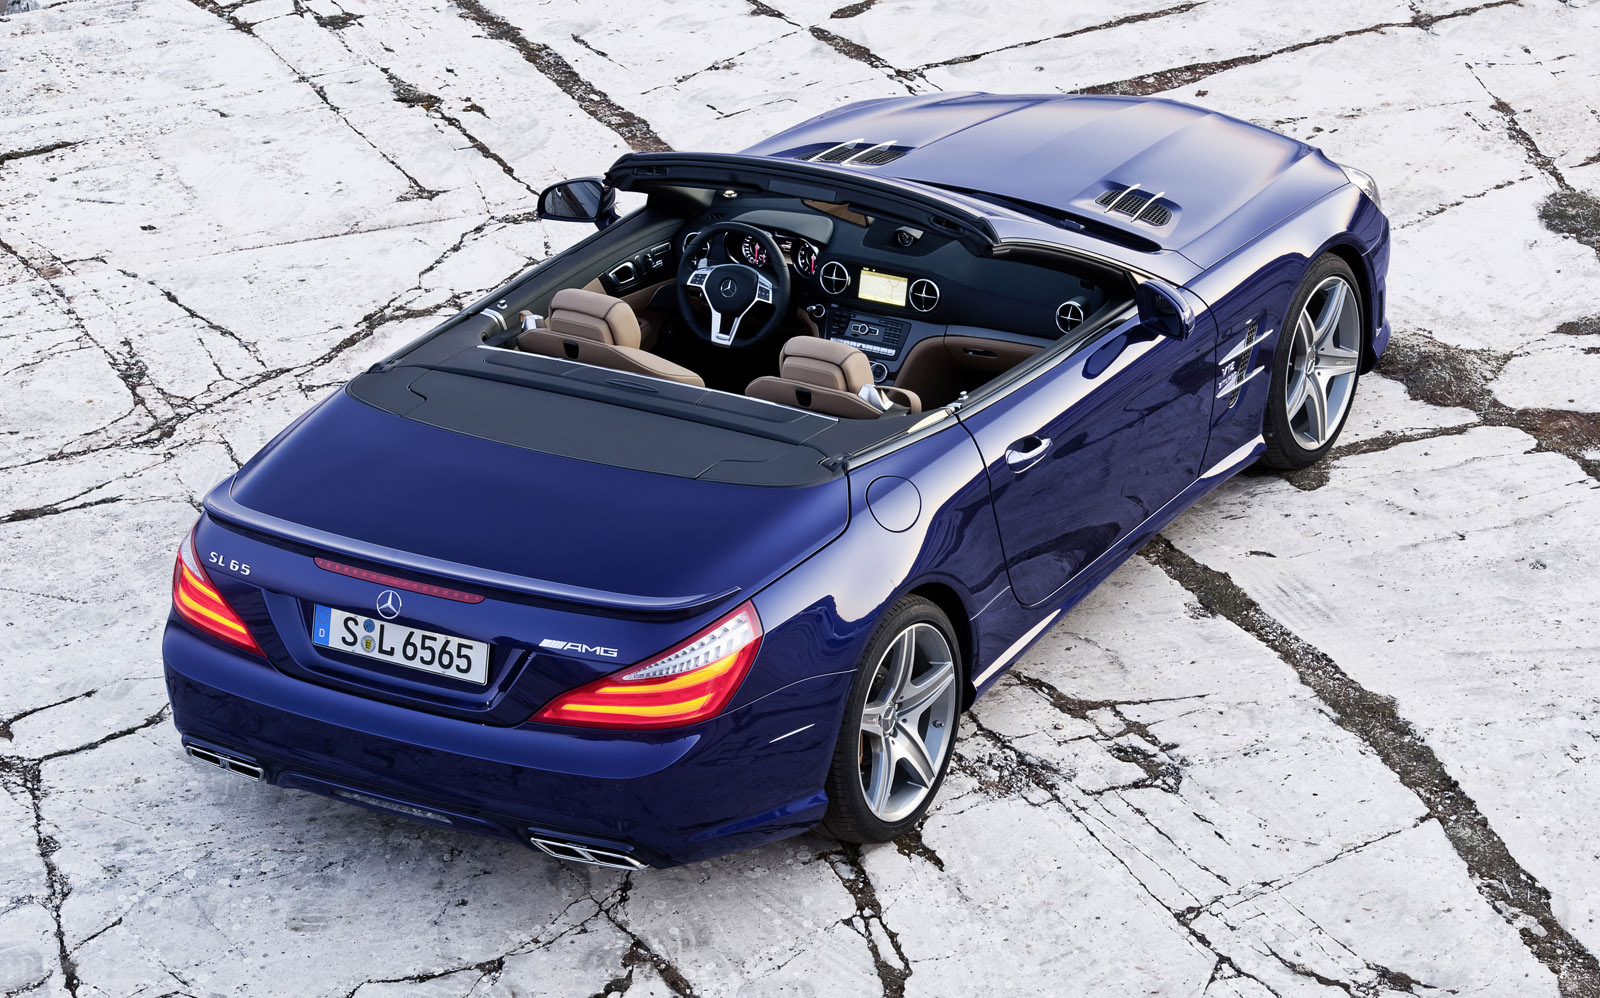 http://2.bp.blogspot.com/-87RBCyD7__M/T-N3XJ2Sw8I/AAAAAAAAD0k/G2i0M4Kdge0/s1600/Mercedes-Benz+SL65+AMG+Hd+Wallpapers+2013_3.jpg